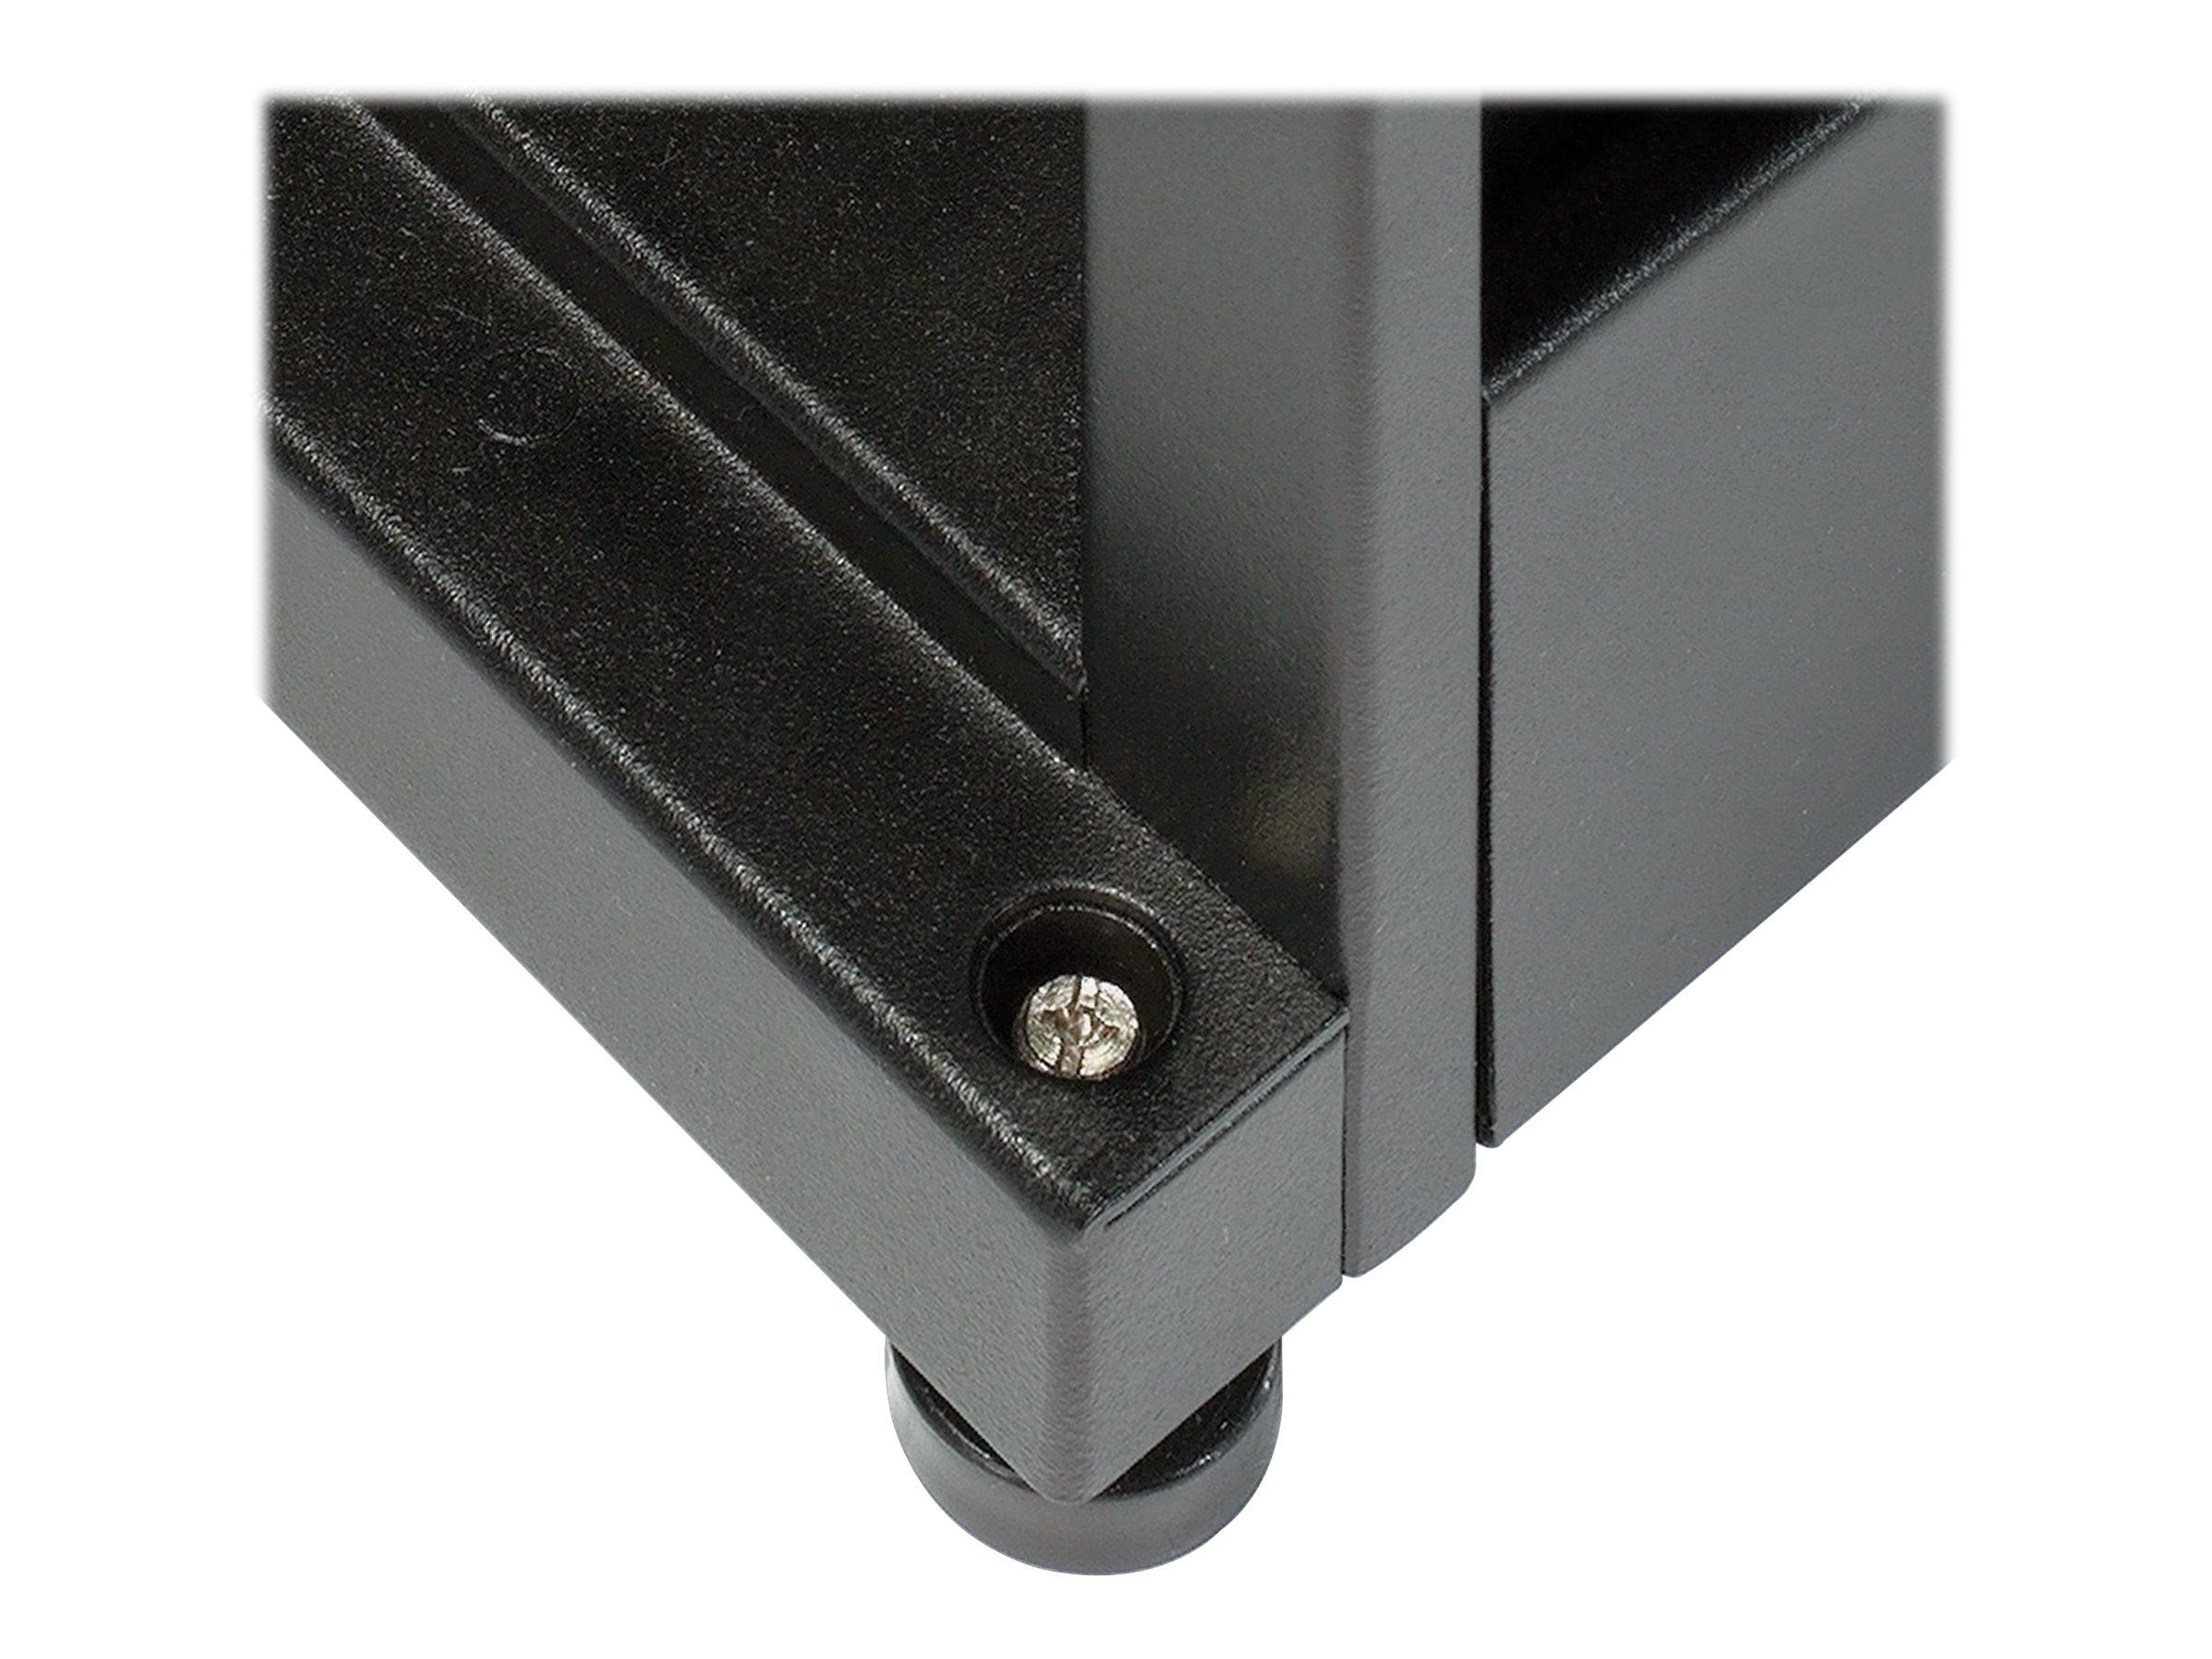 Apc Netshelter Sx 42u Rack Enclosure With Sides Instant Rebate Server Ar3100